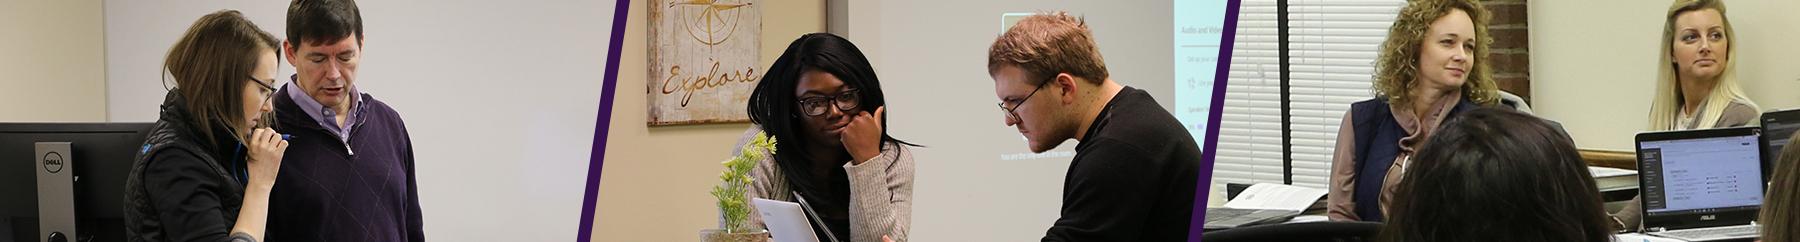 ashland-design-web-hero-image-Classrooms-1